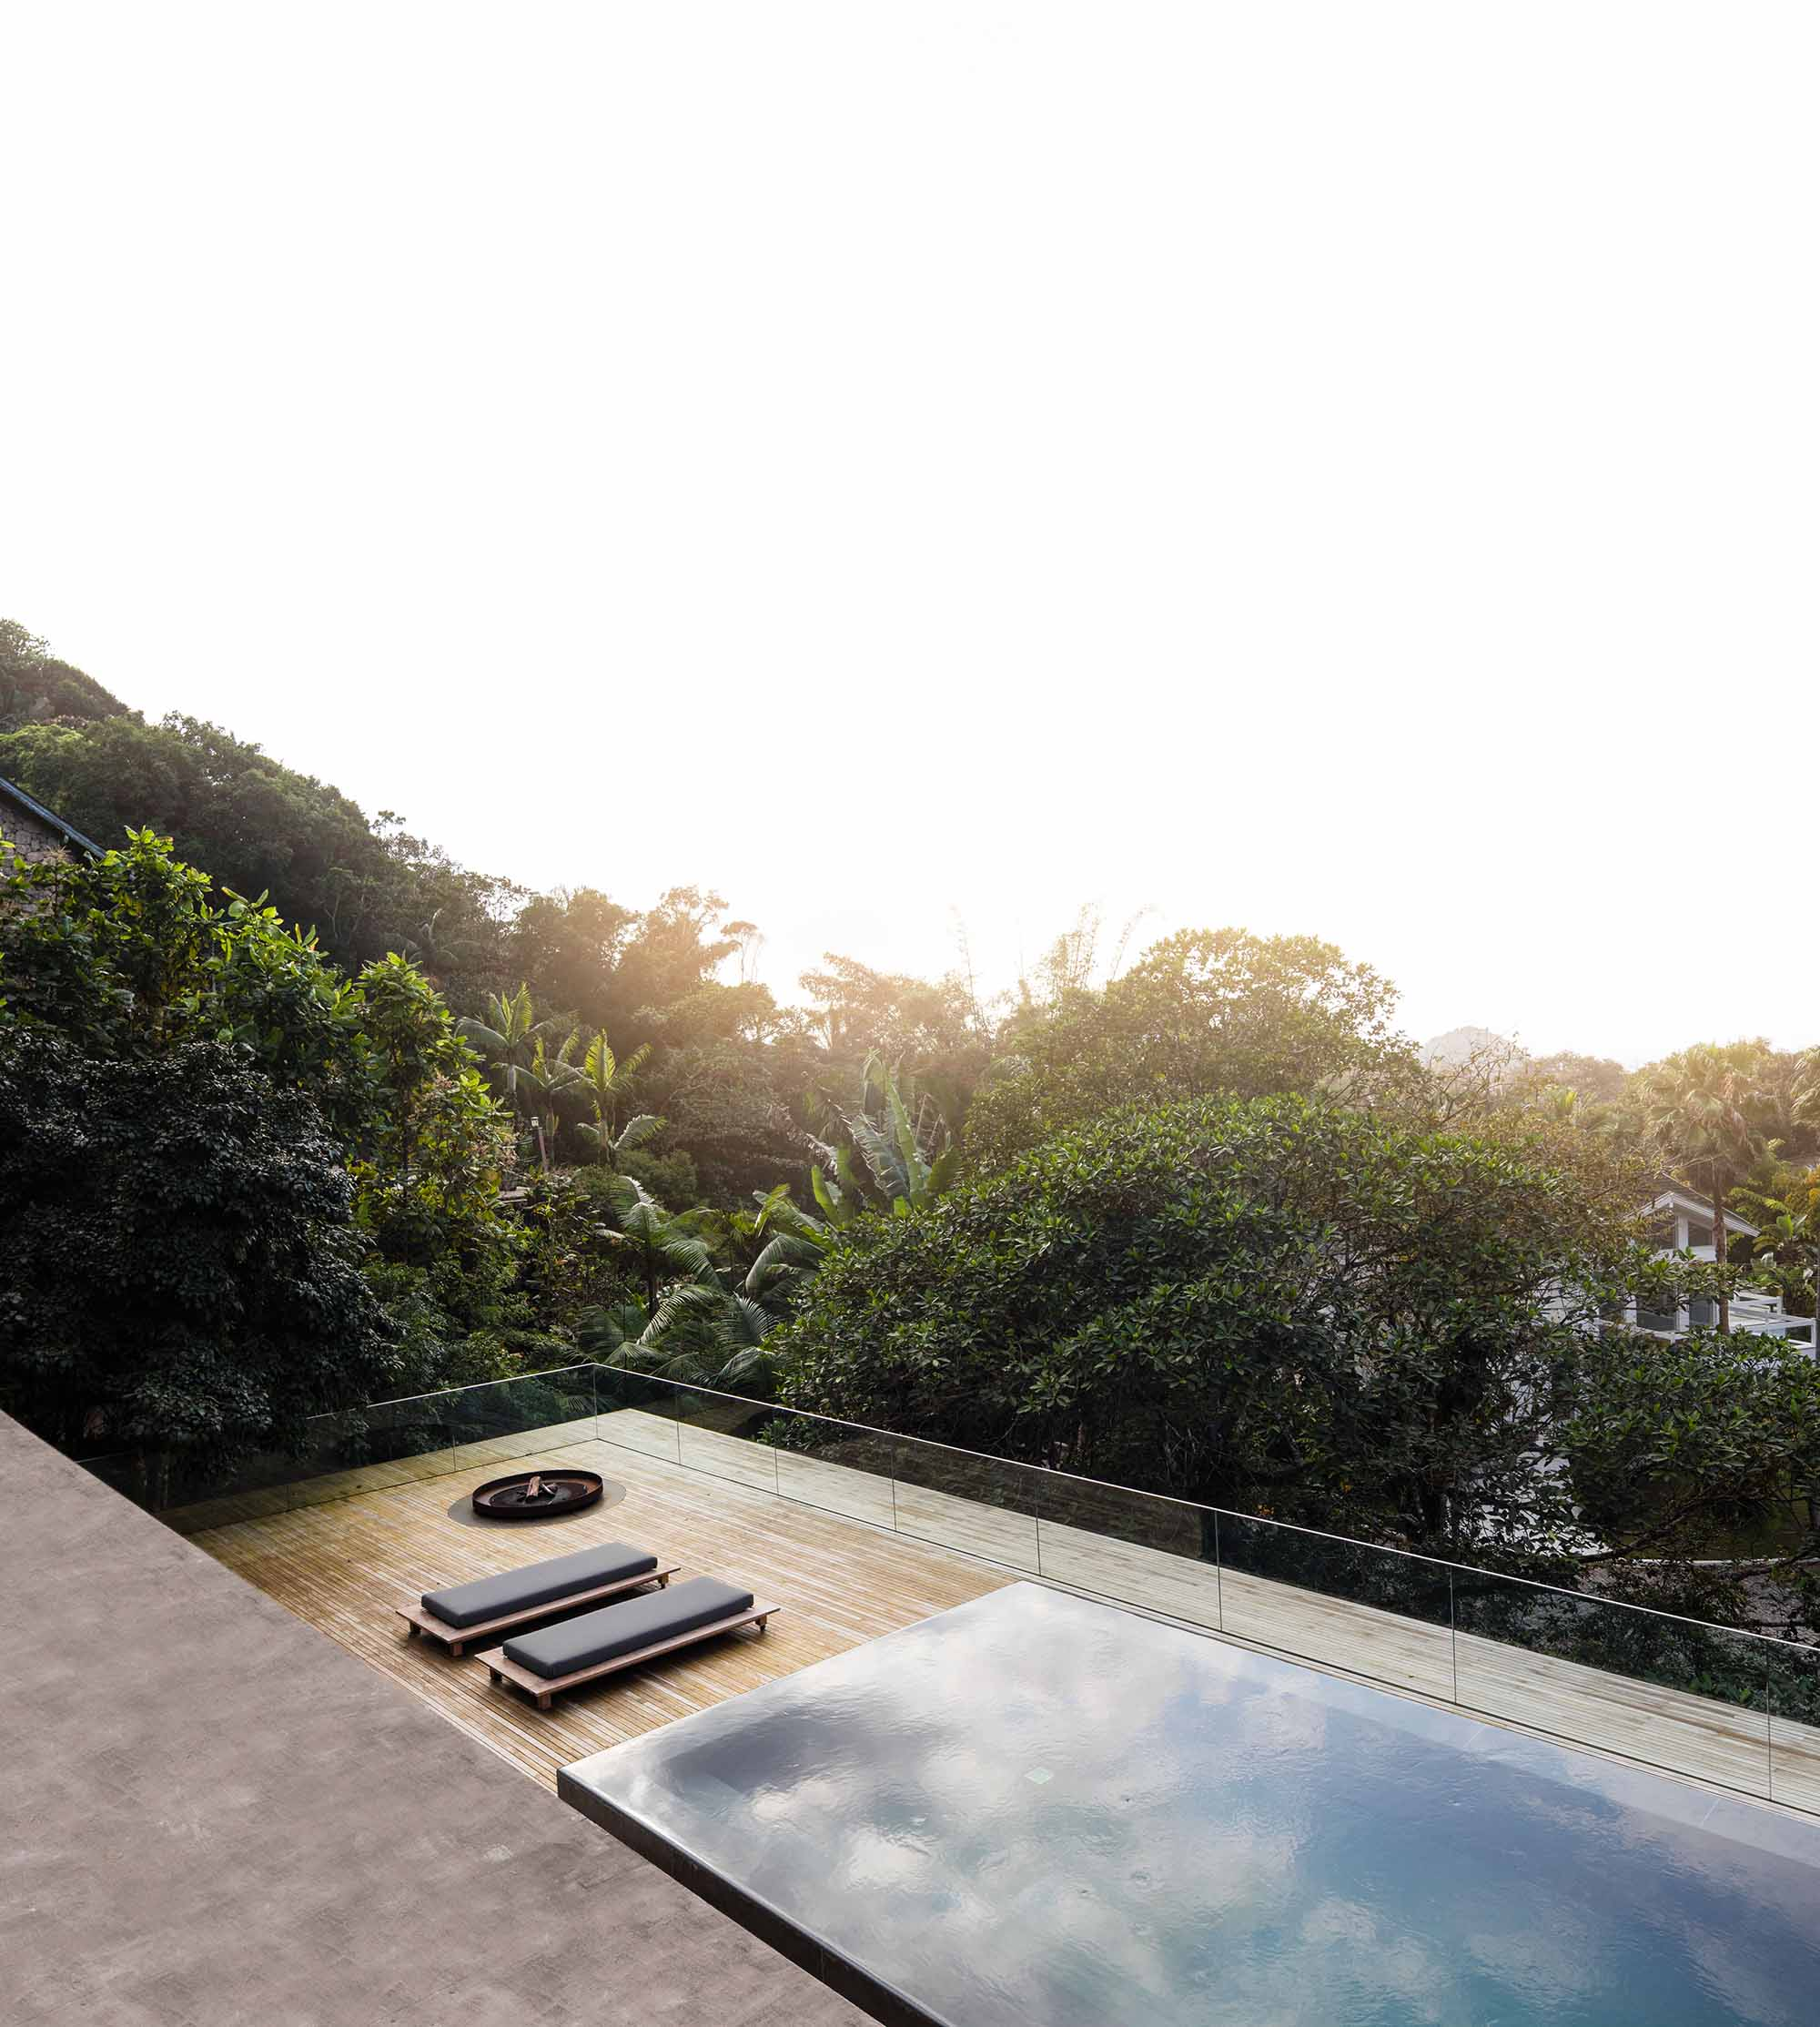 H-House-Life-Jungle-House-Casa-Da-Mata-studio-mk27-mk27_namata_fernandoguerra_medium(38).JPG